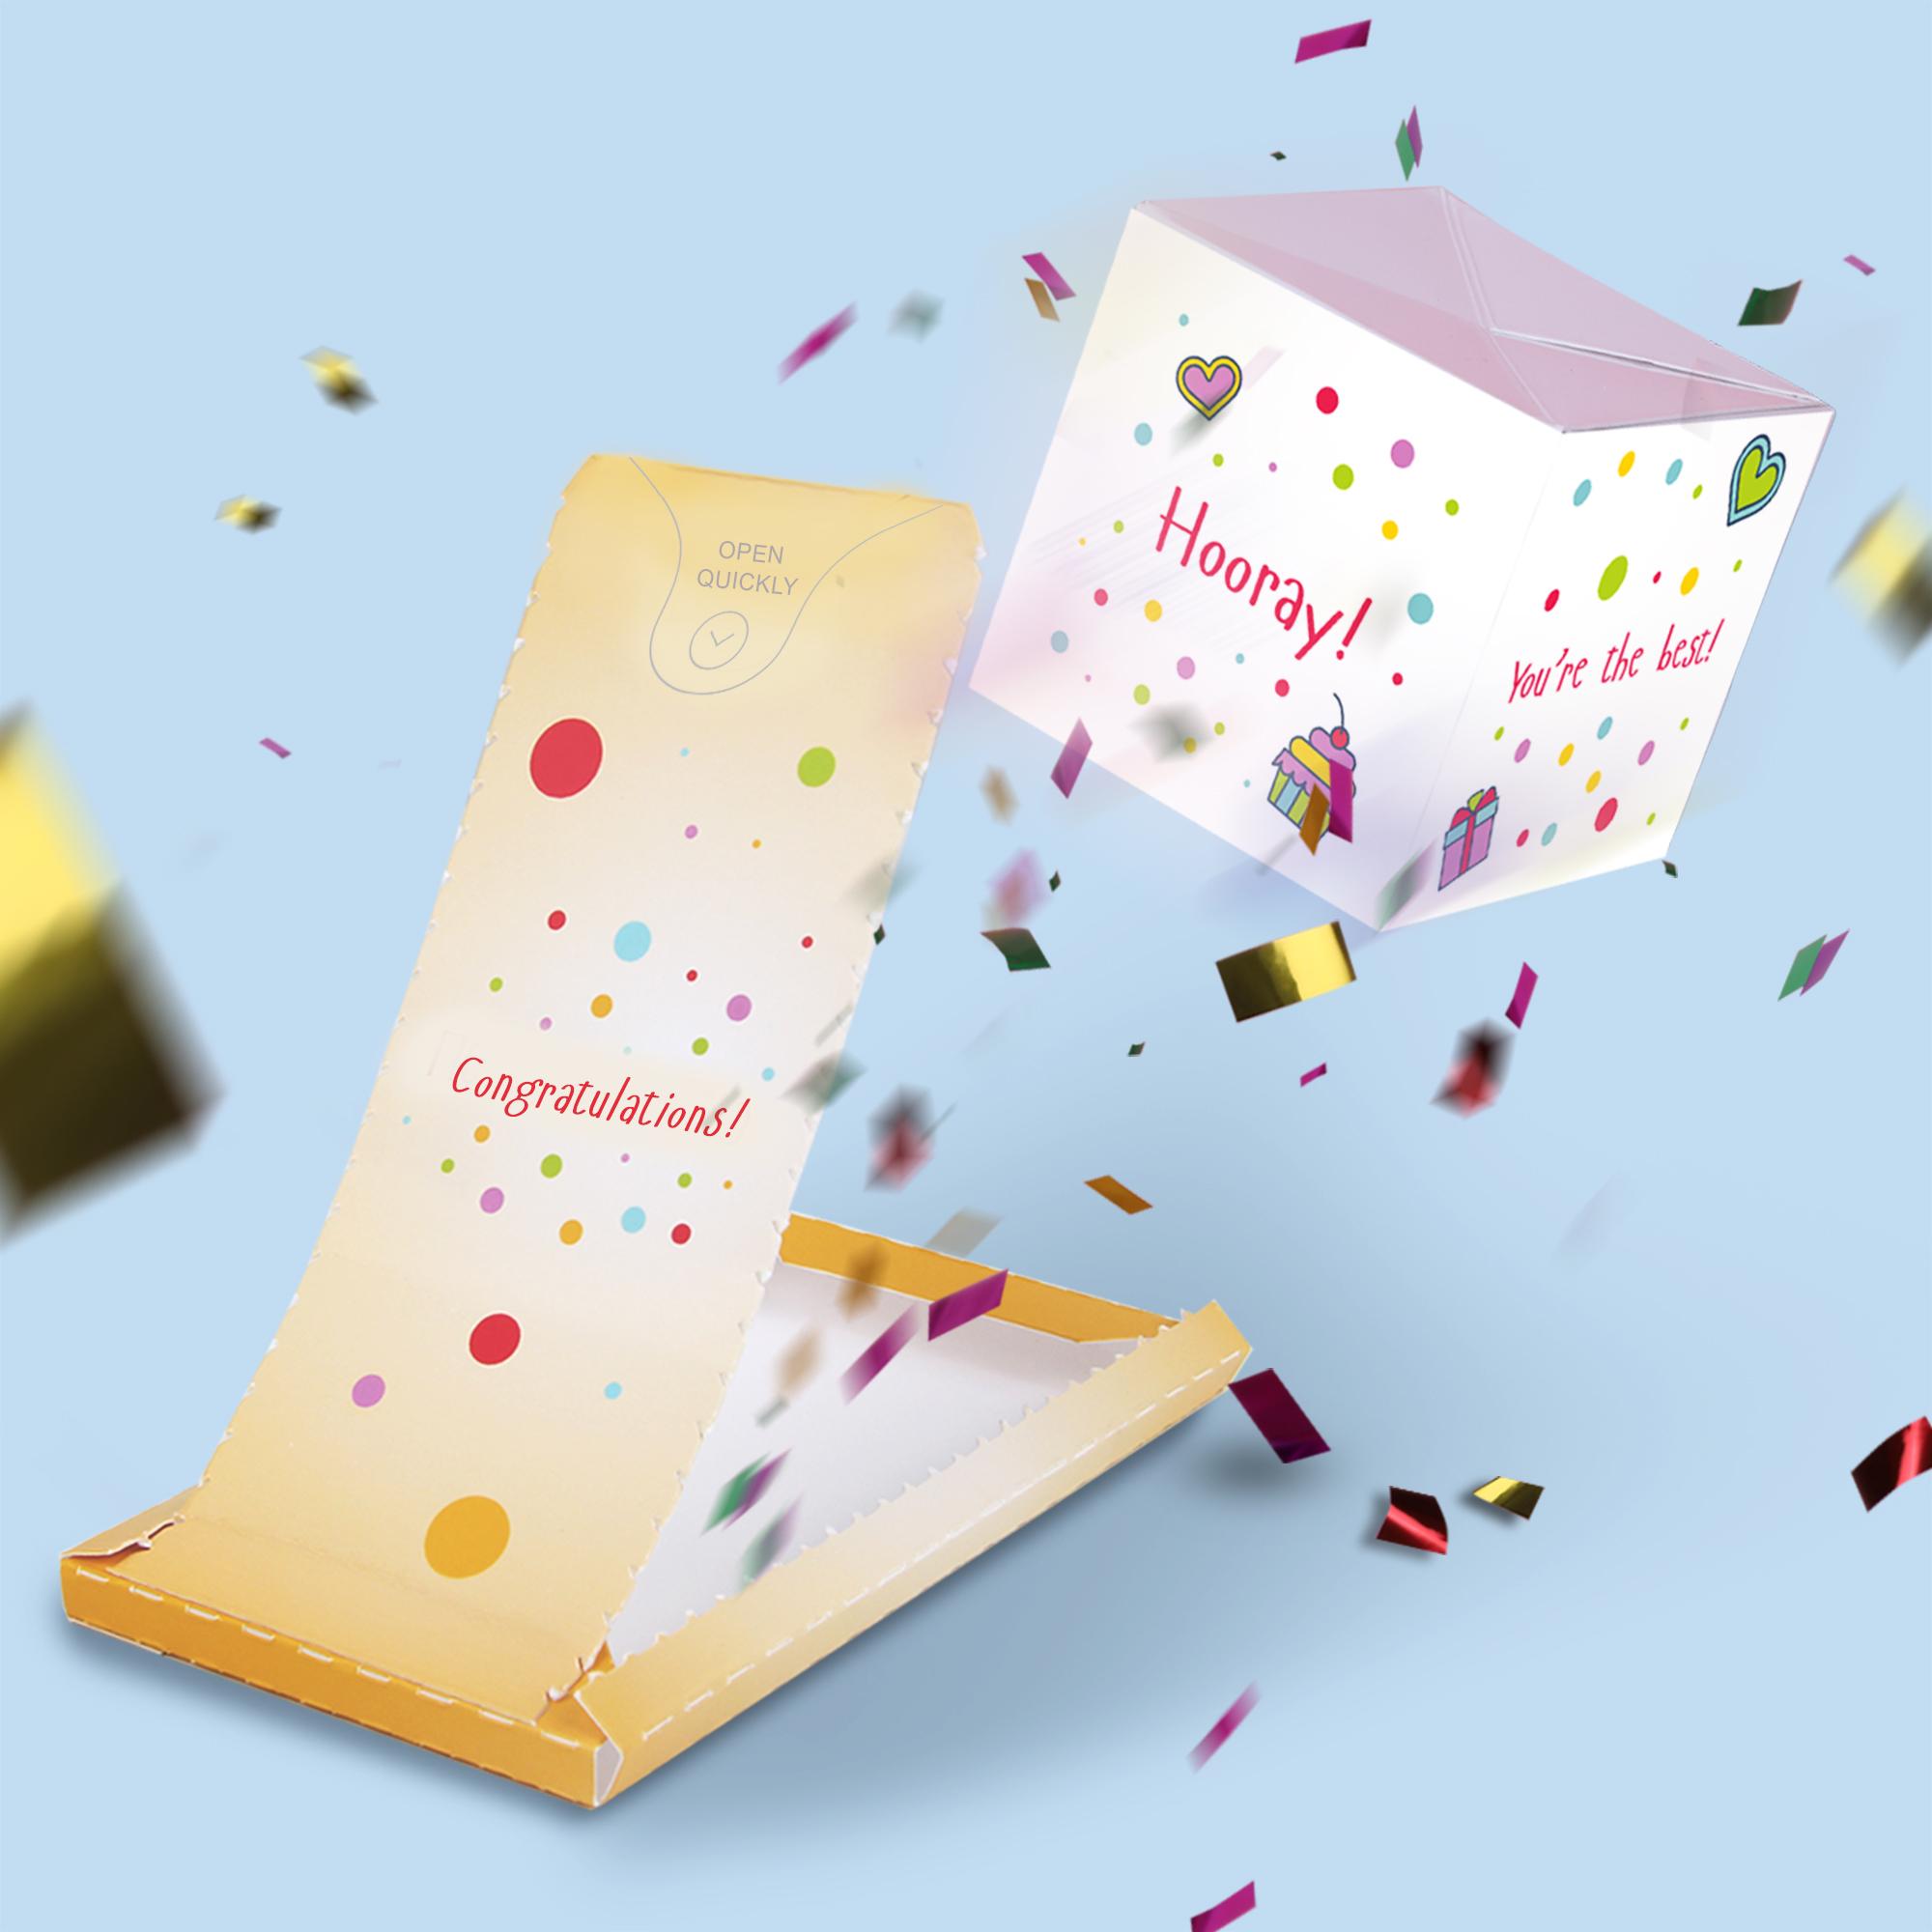 Boom card - Congratulations